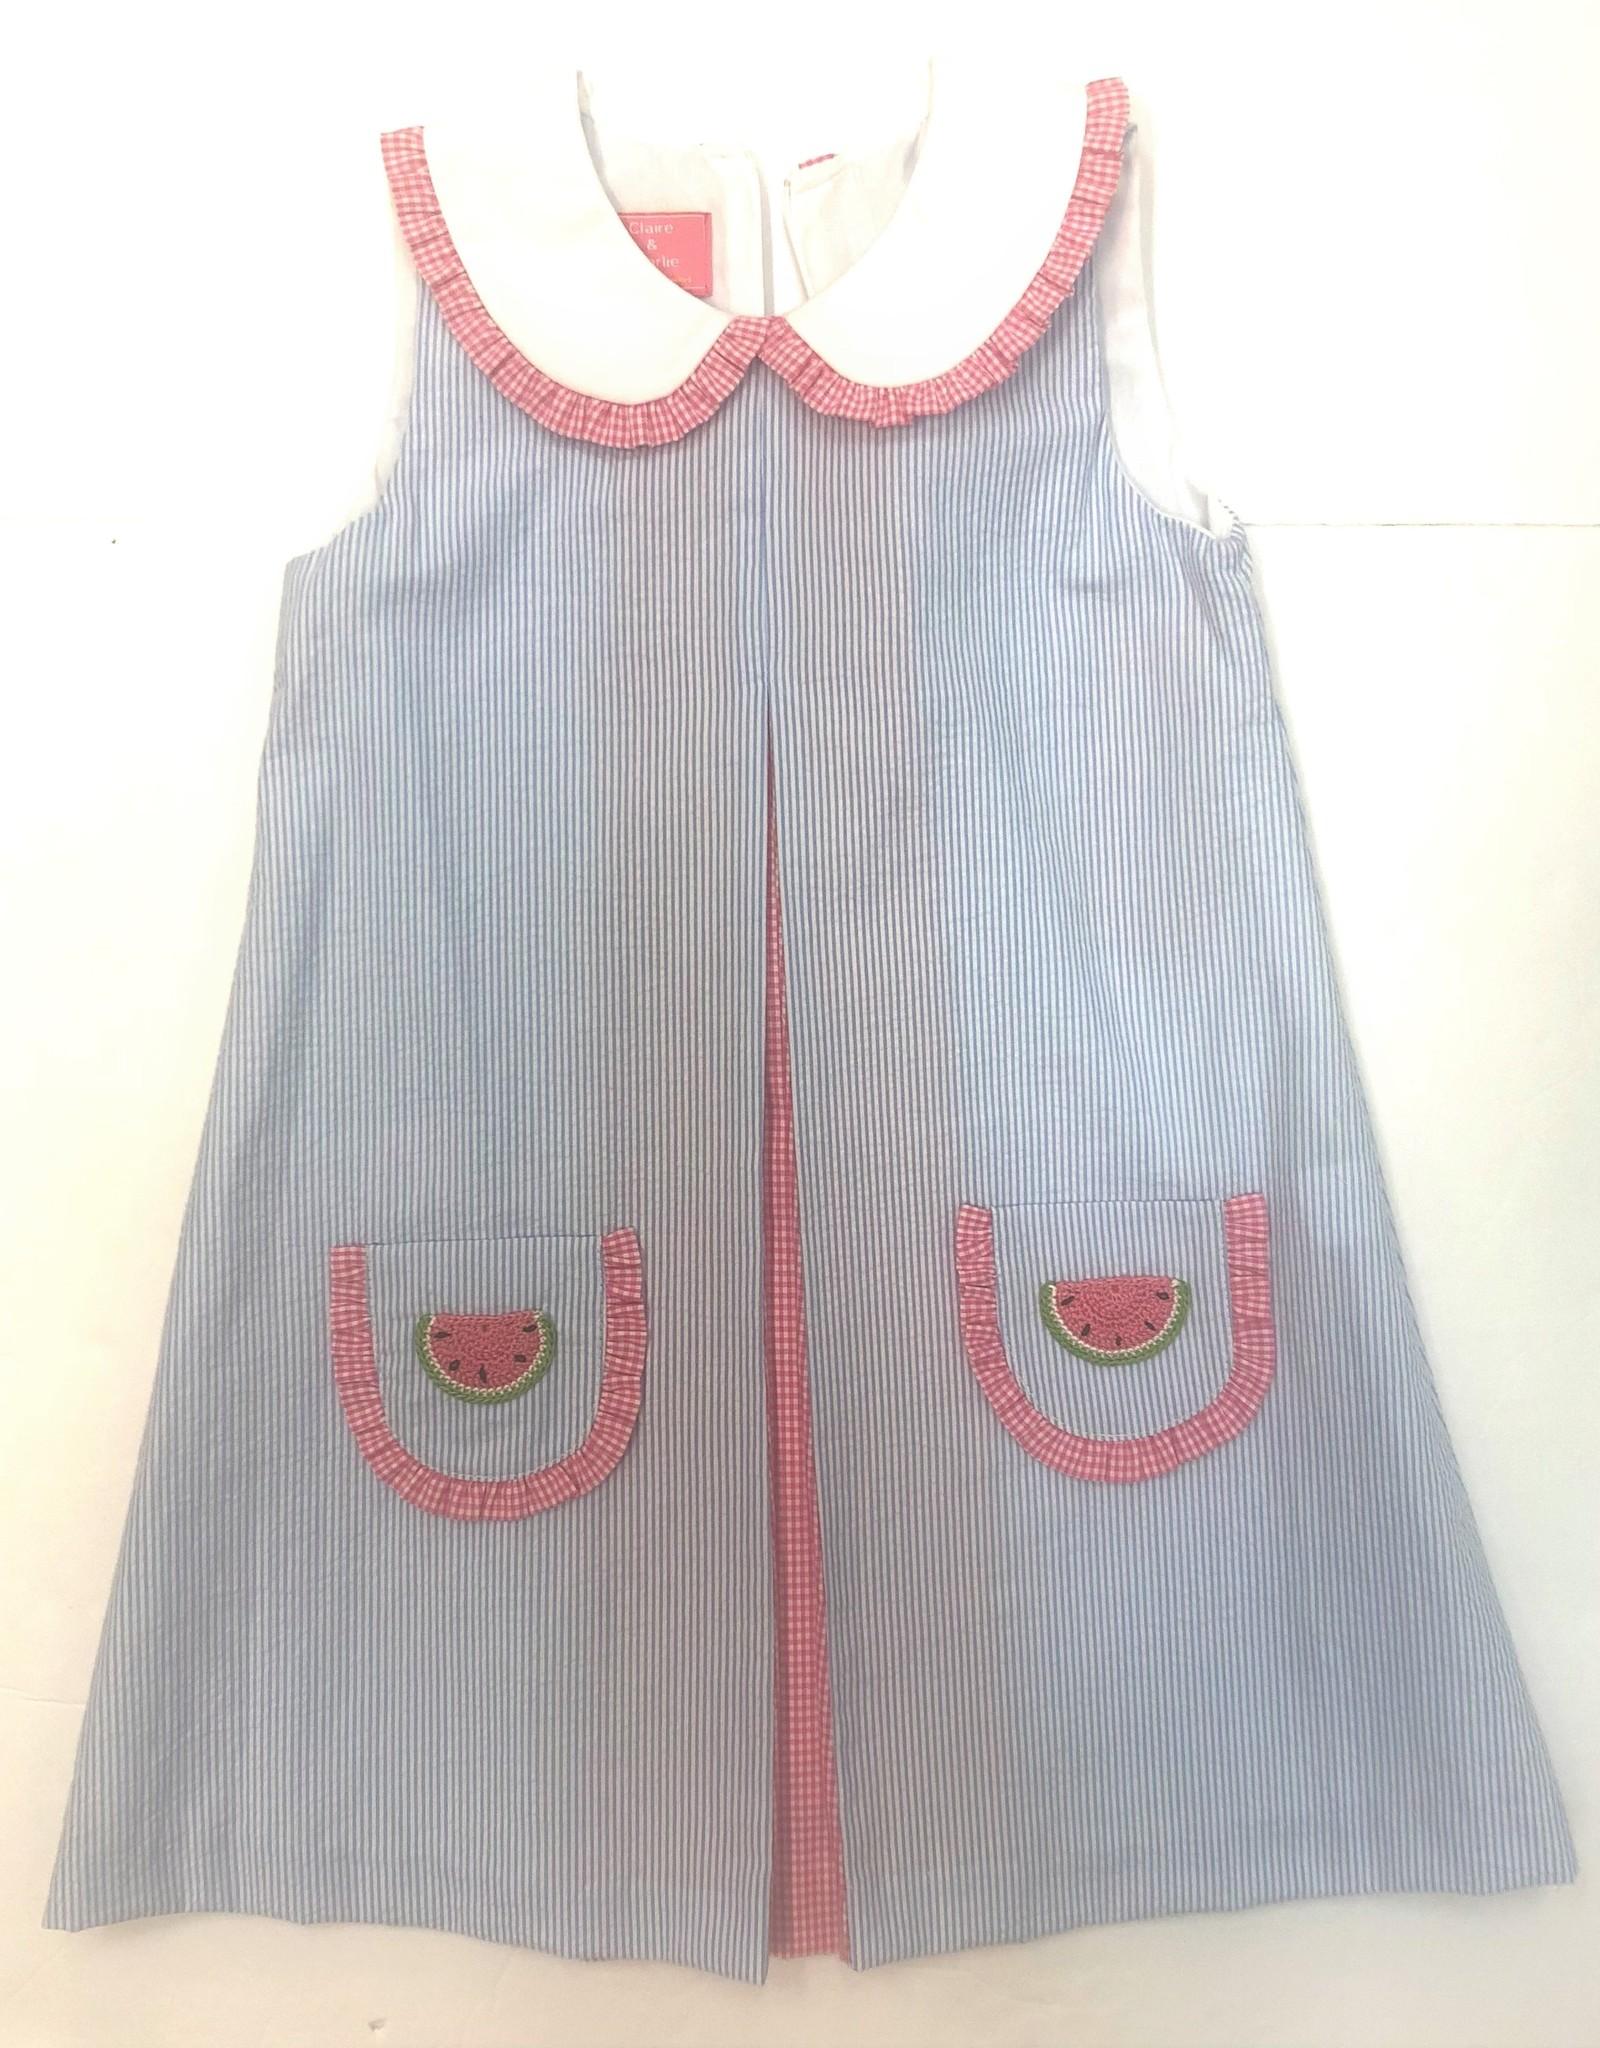 Claire and Charlie Blue Seersucker Watermelon Dress W/ Pleats & Pockets